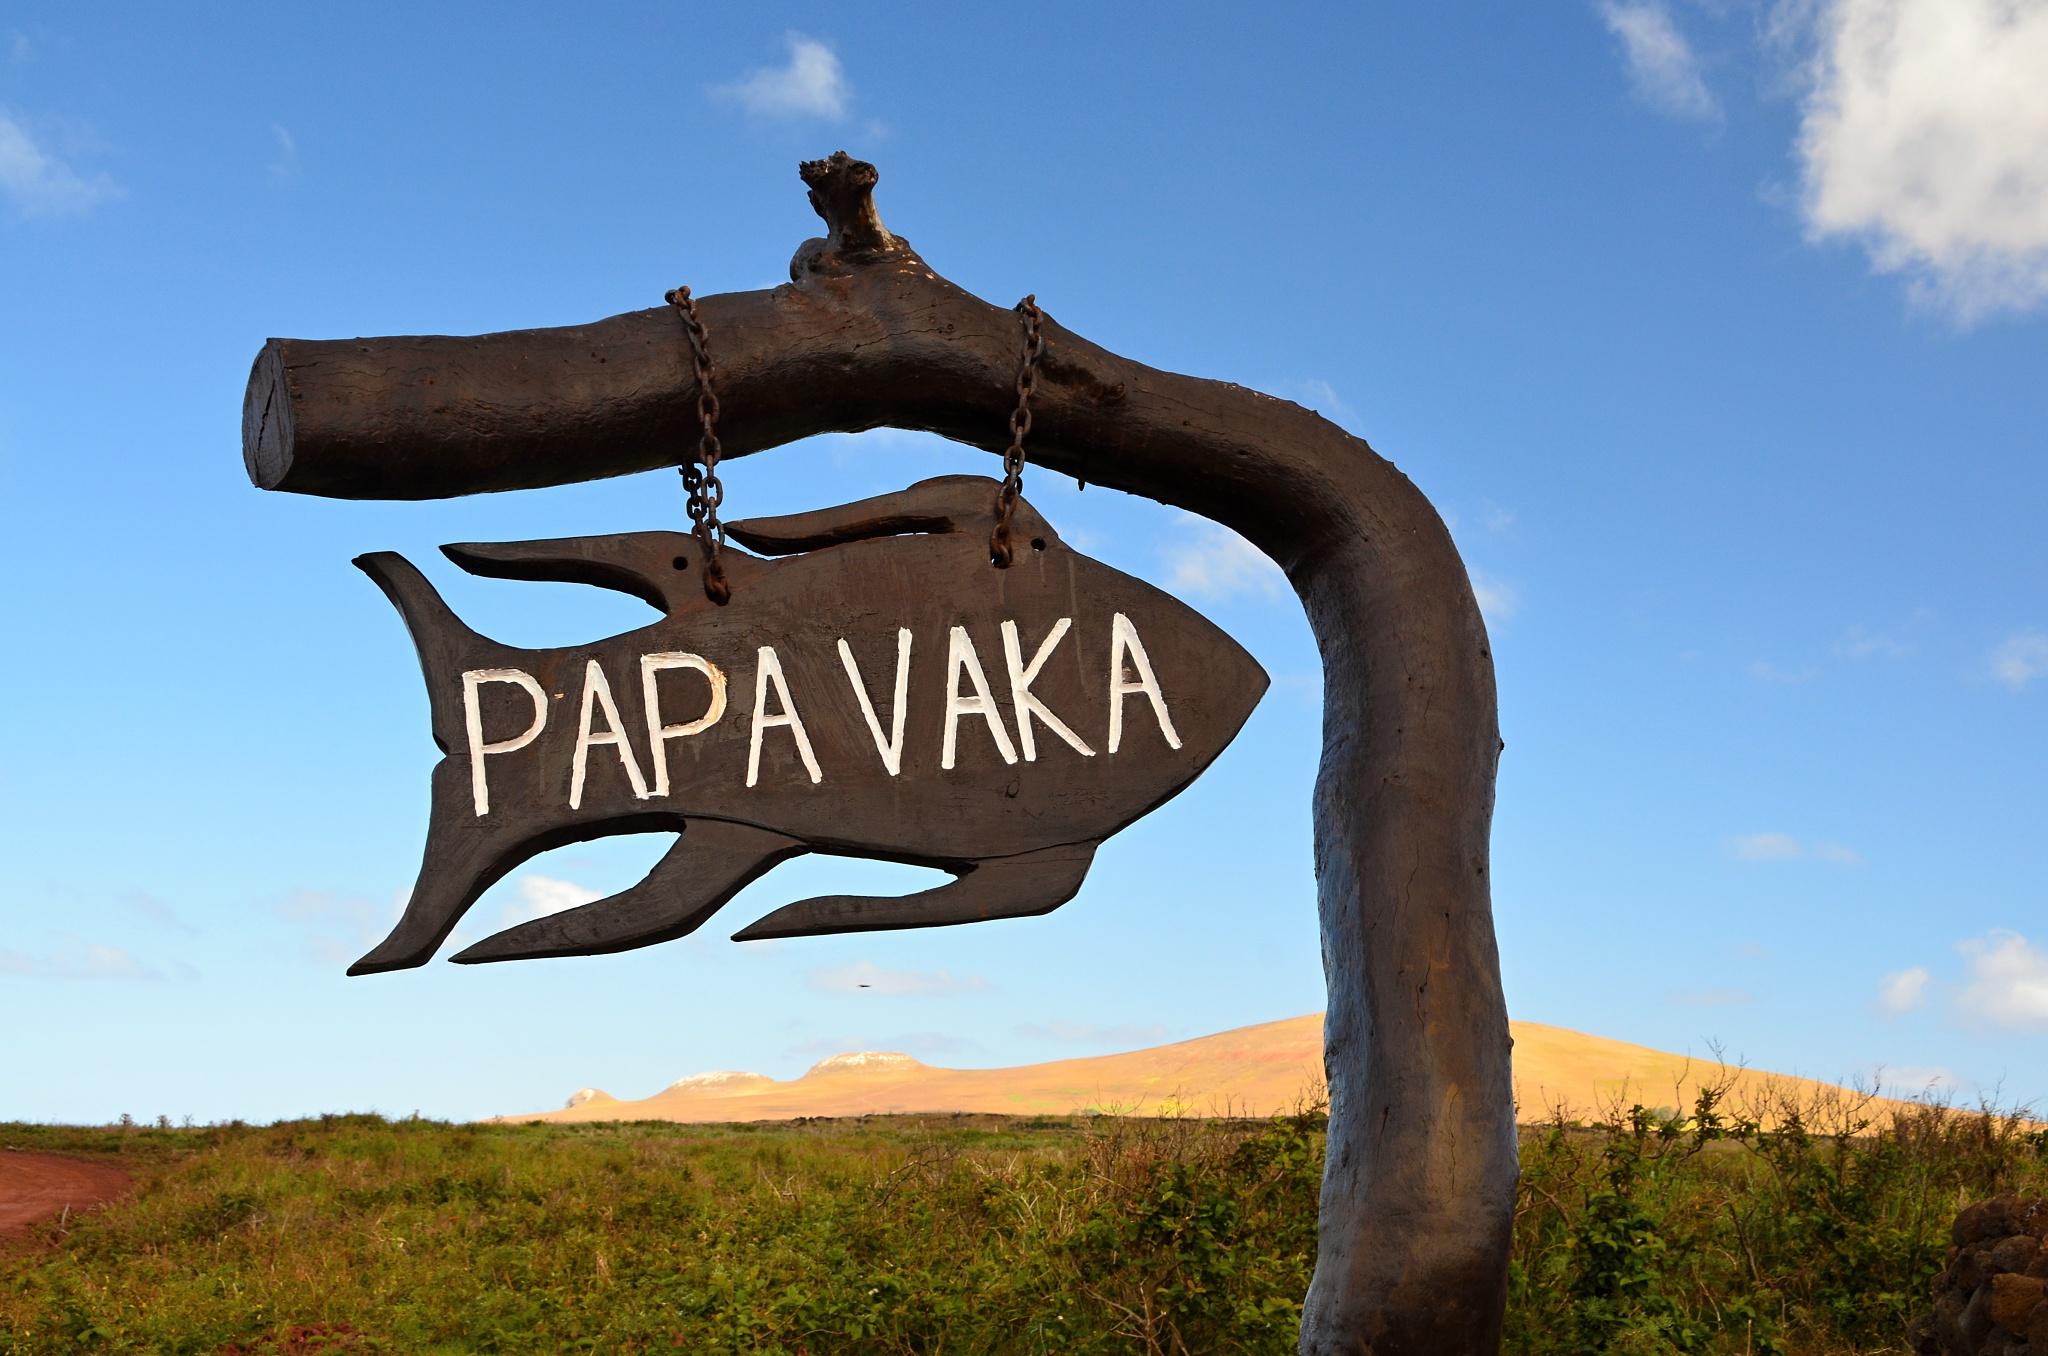 Posvátné místo Papa Vaka plné petroglyfů